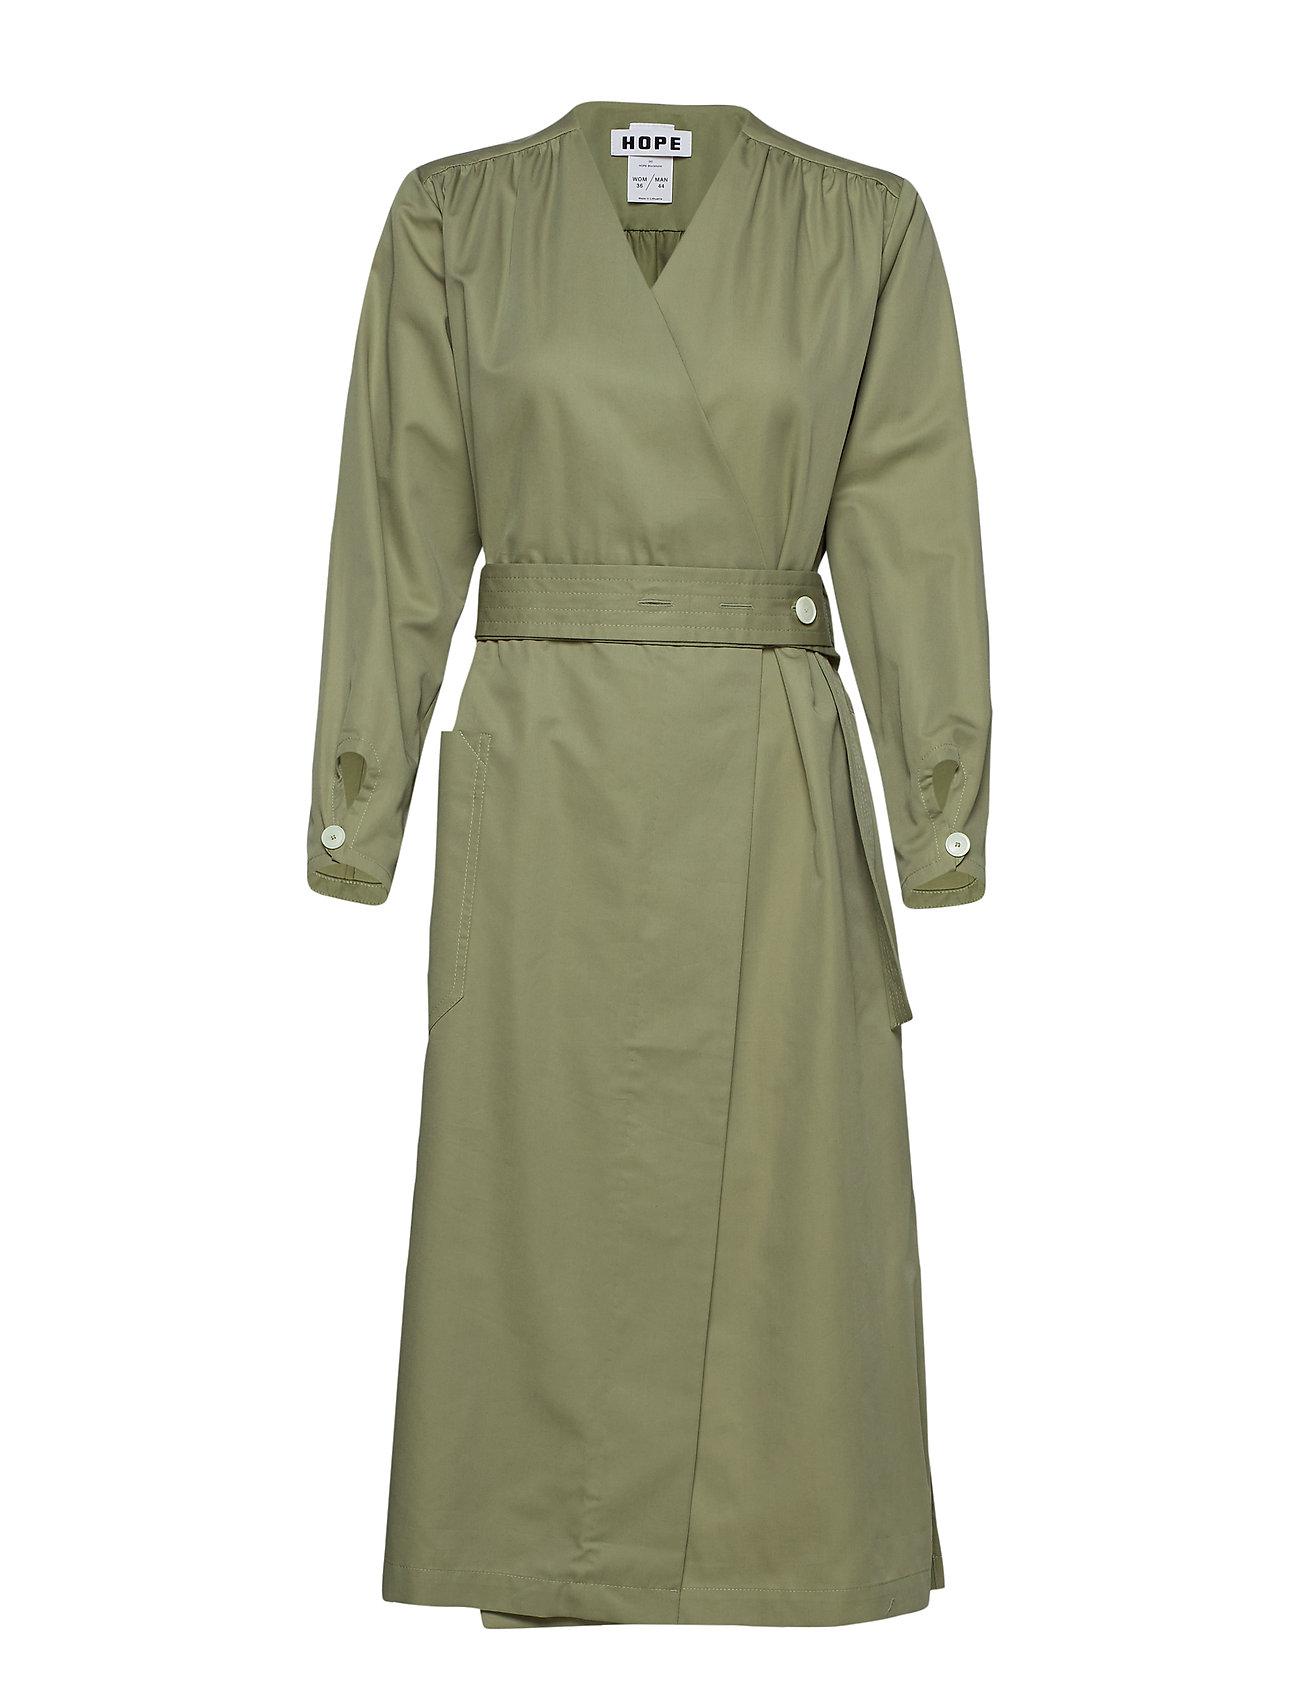 Hope Cross Dress - PALE GREEN